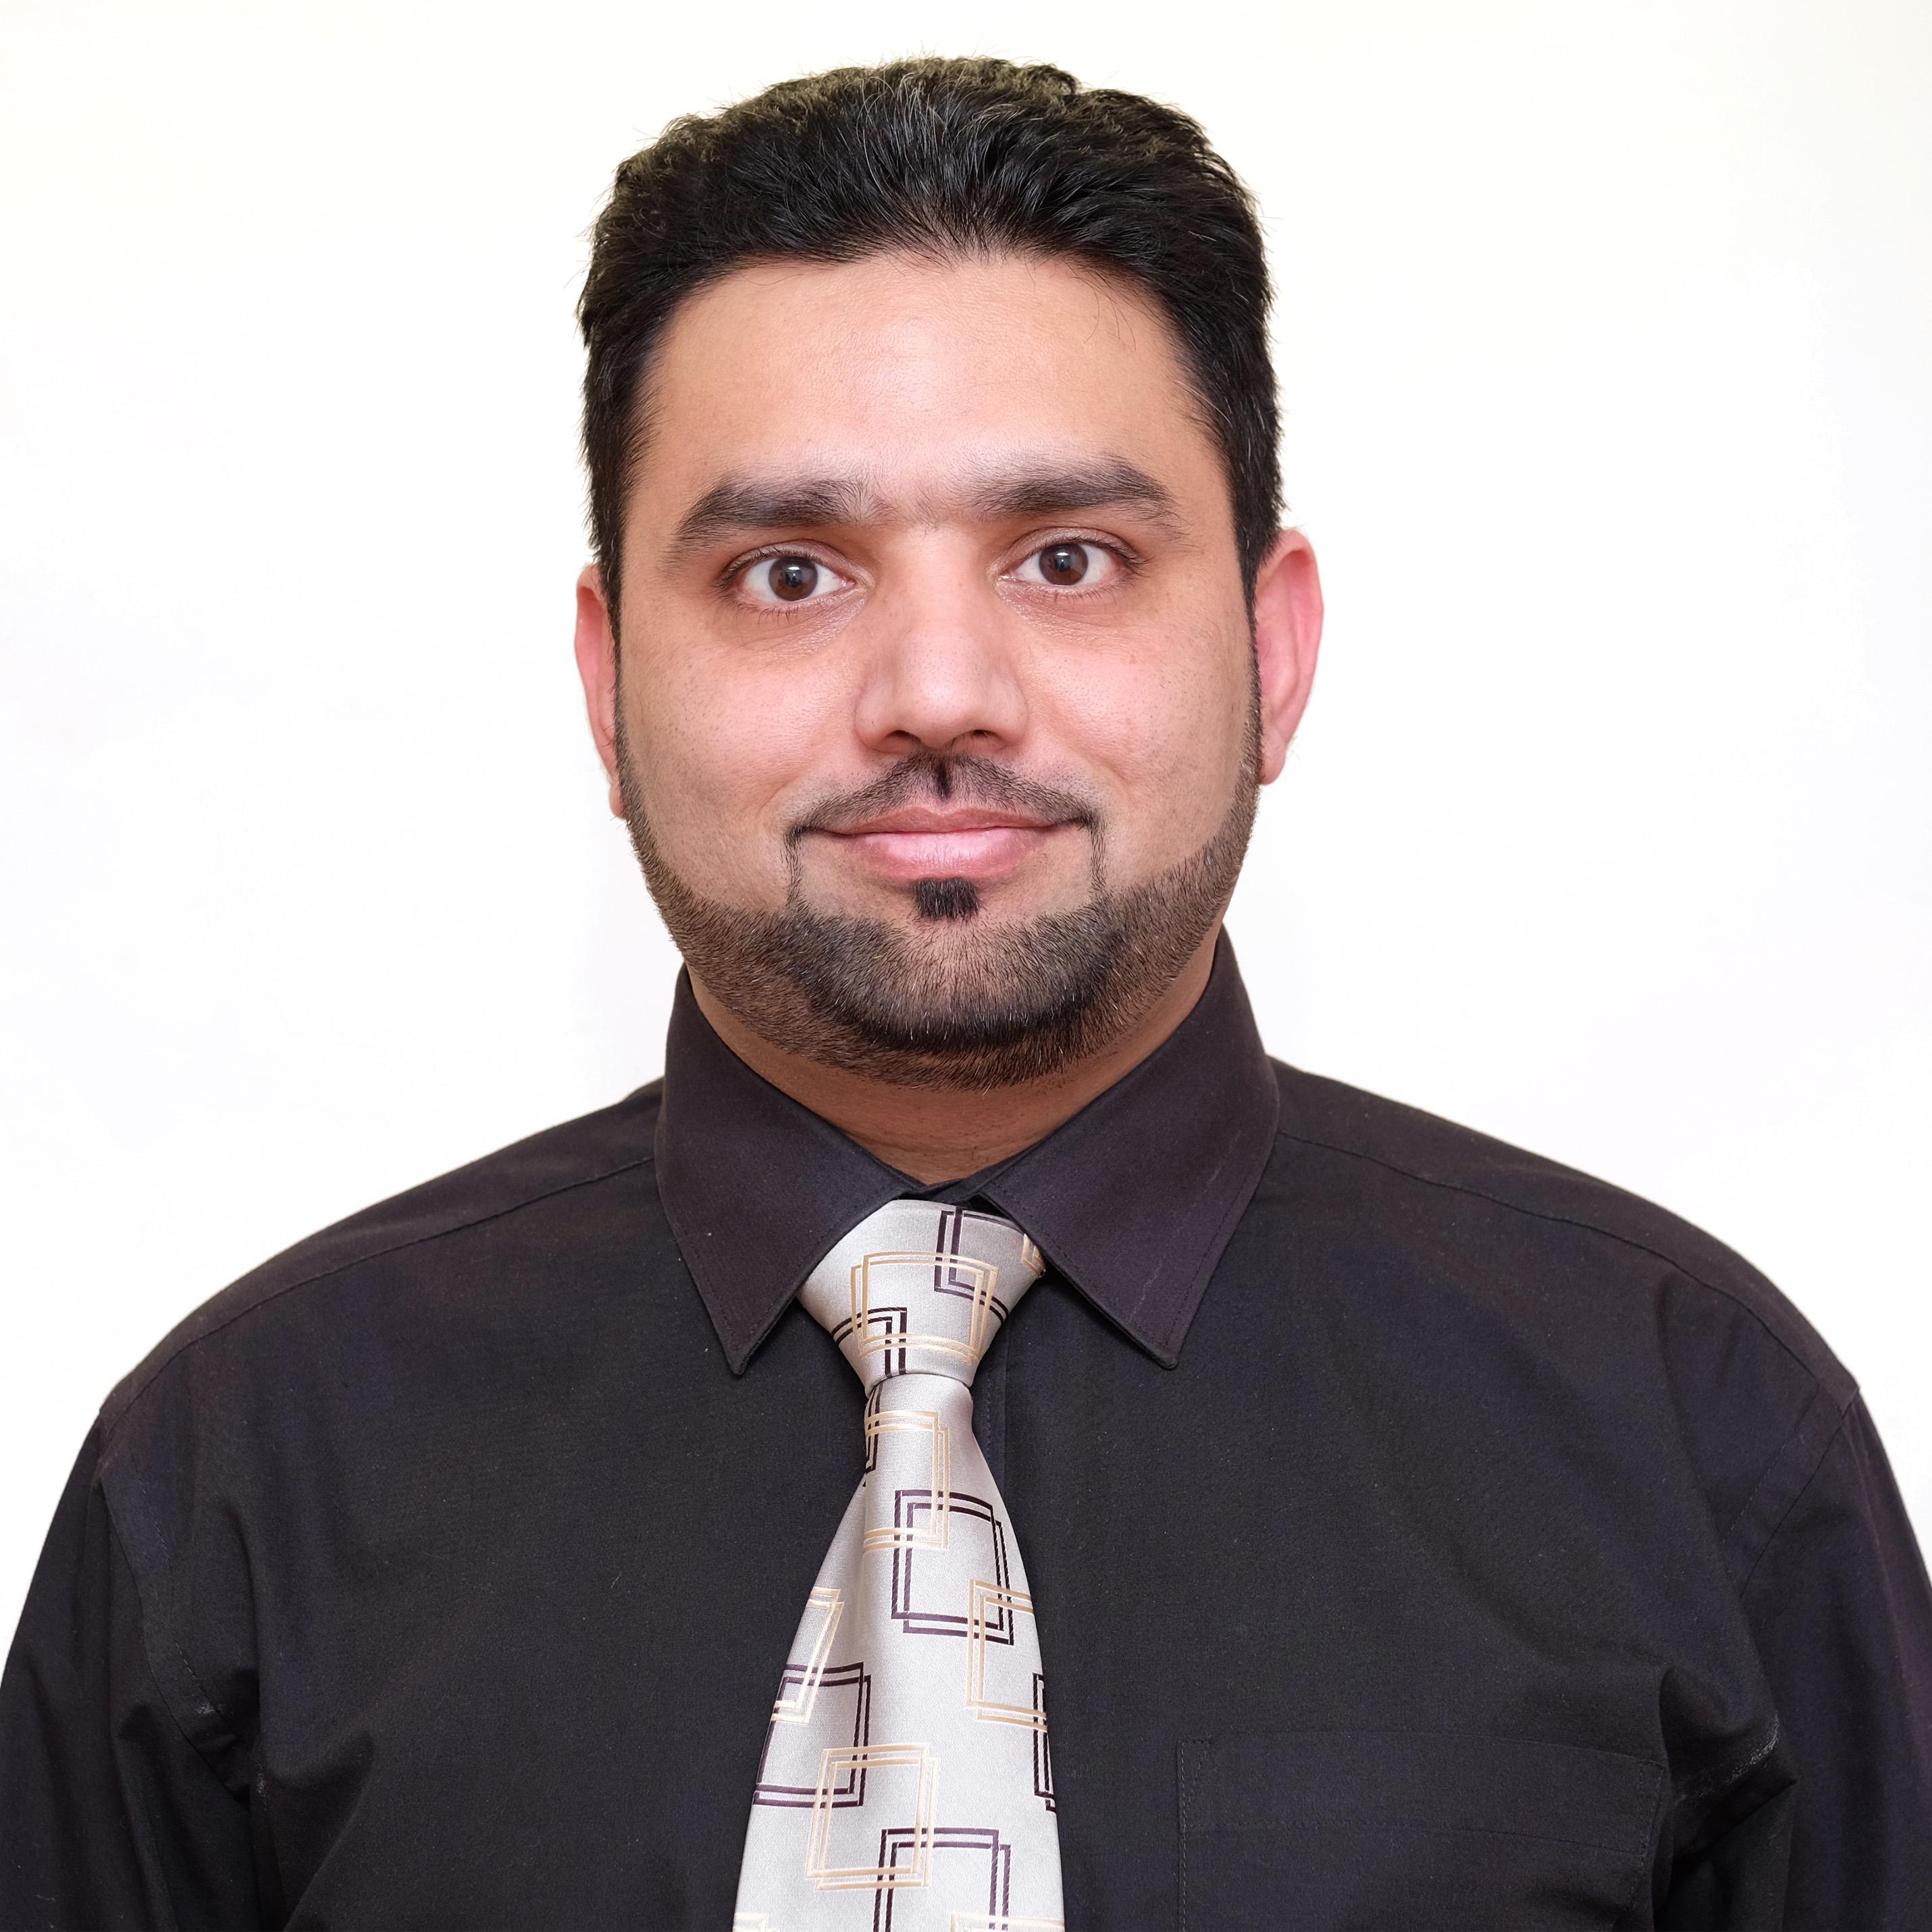 Faisal Yaqoob Sultani